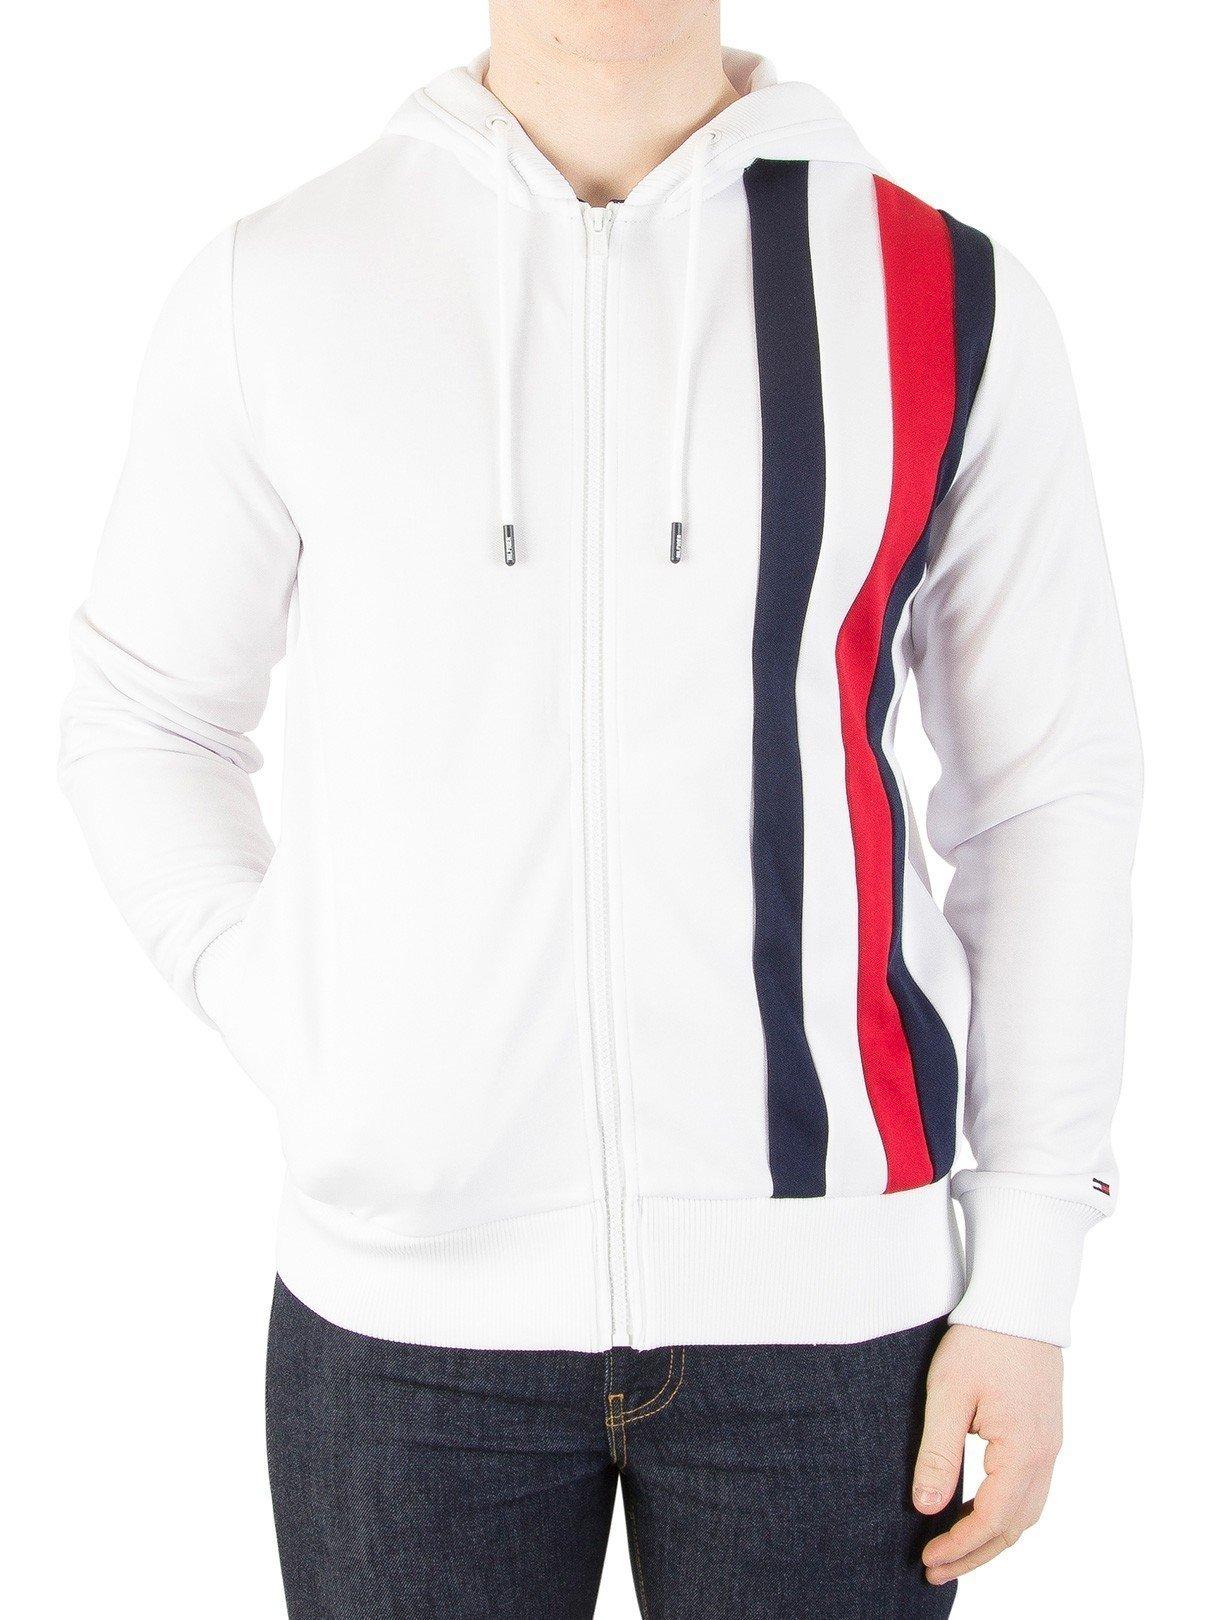 Tommy Hilfiger Men's Sporty Tech Zip Jacket, White, Large by Tommy Hilfiger